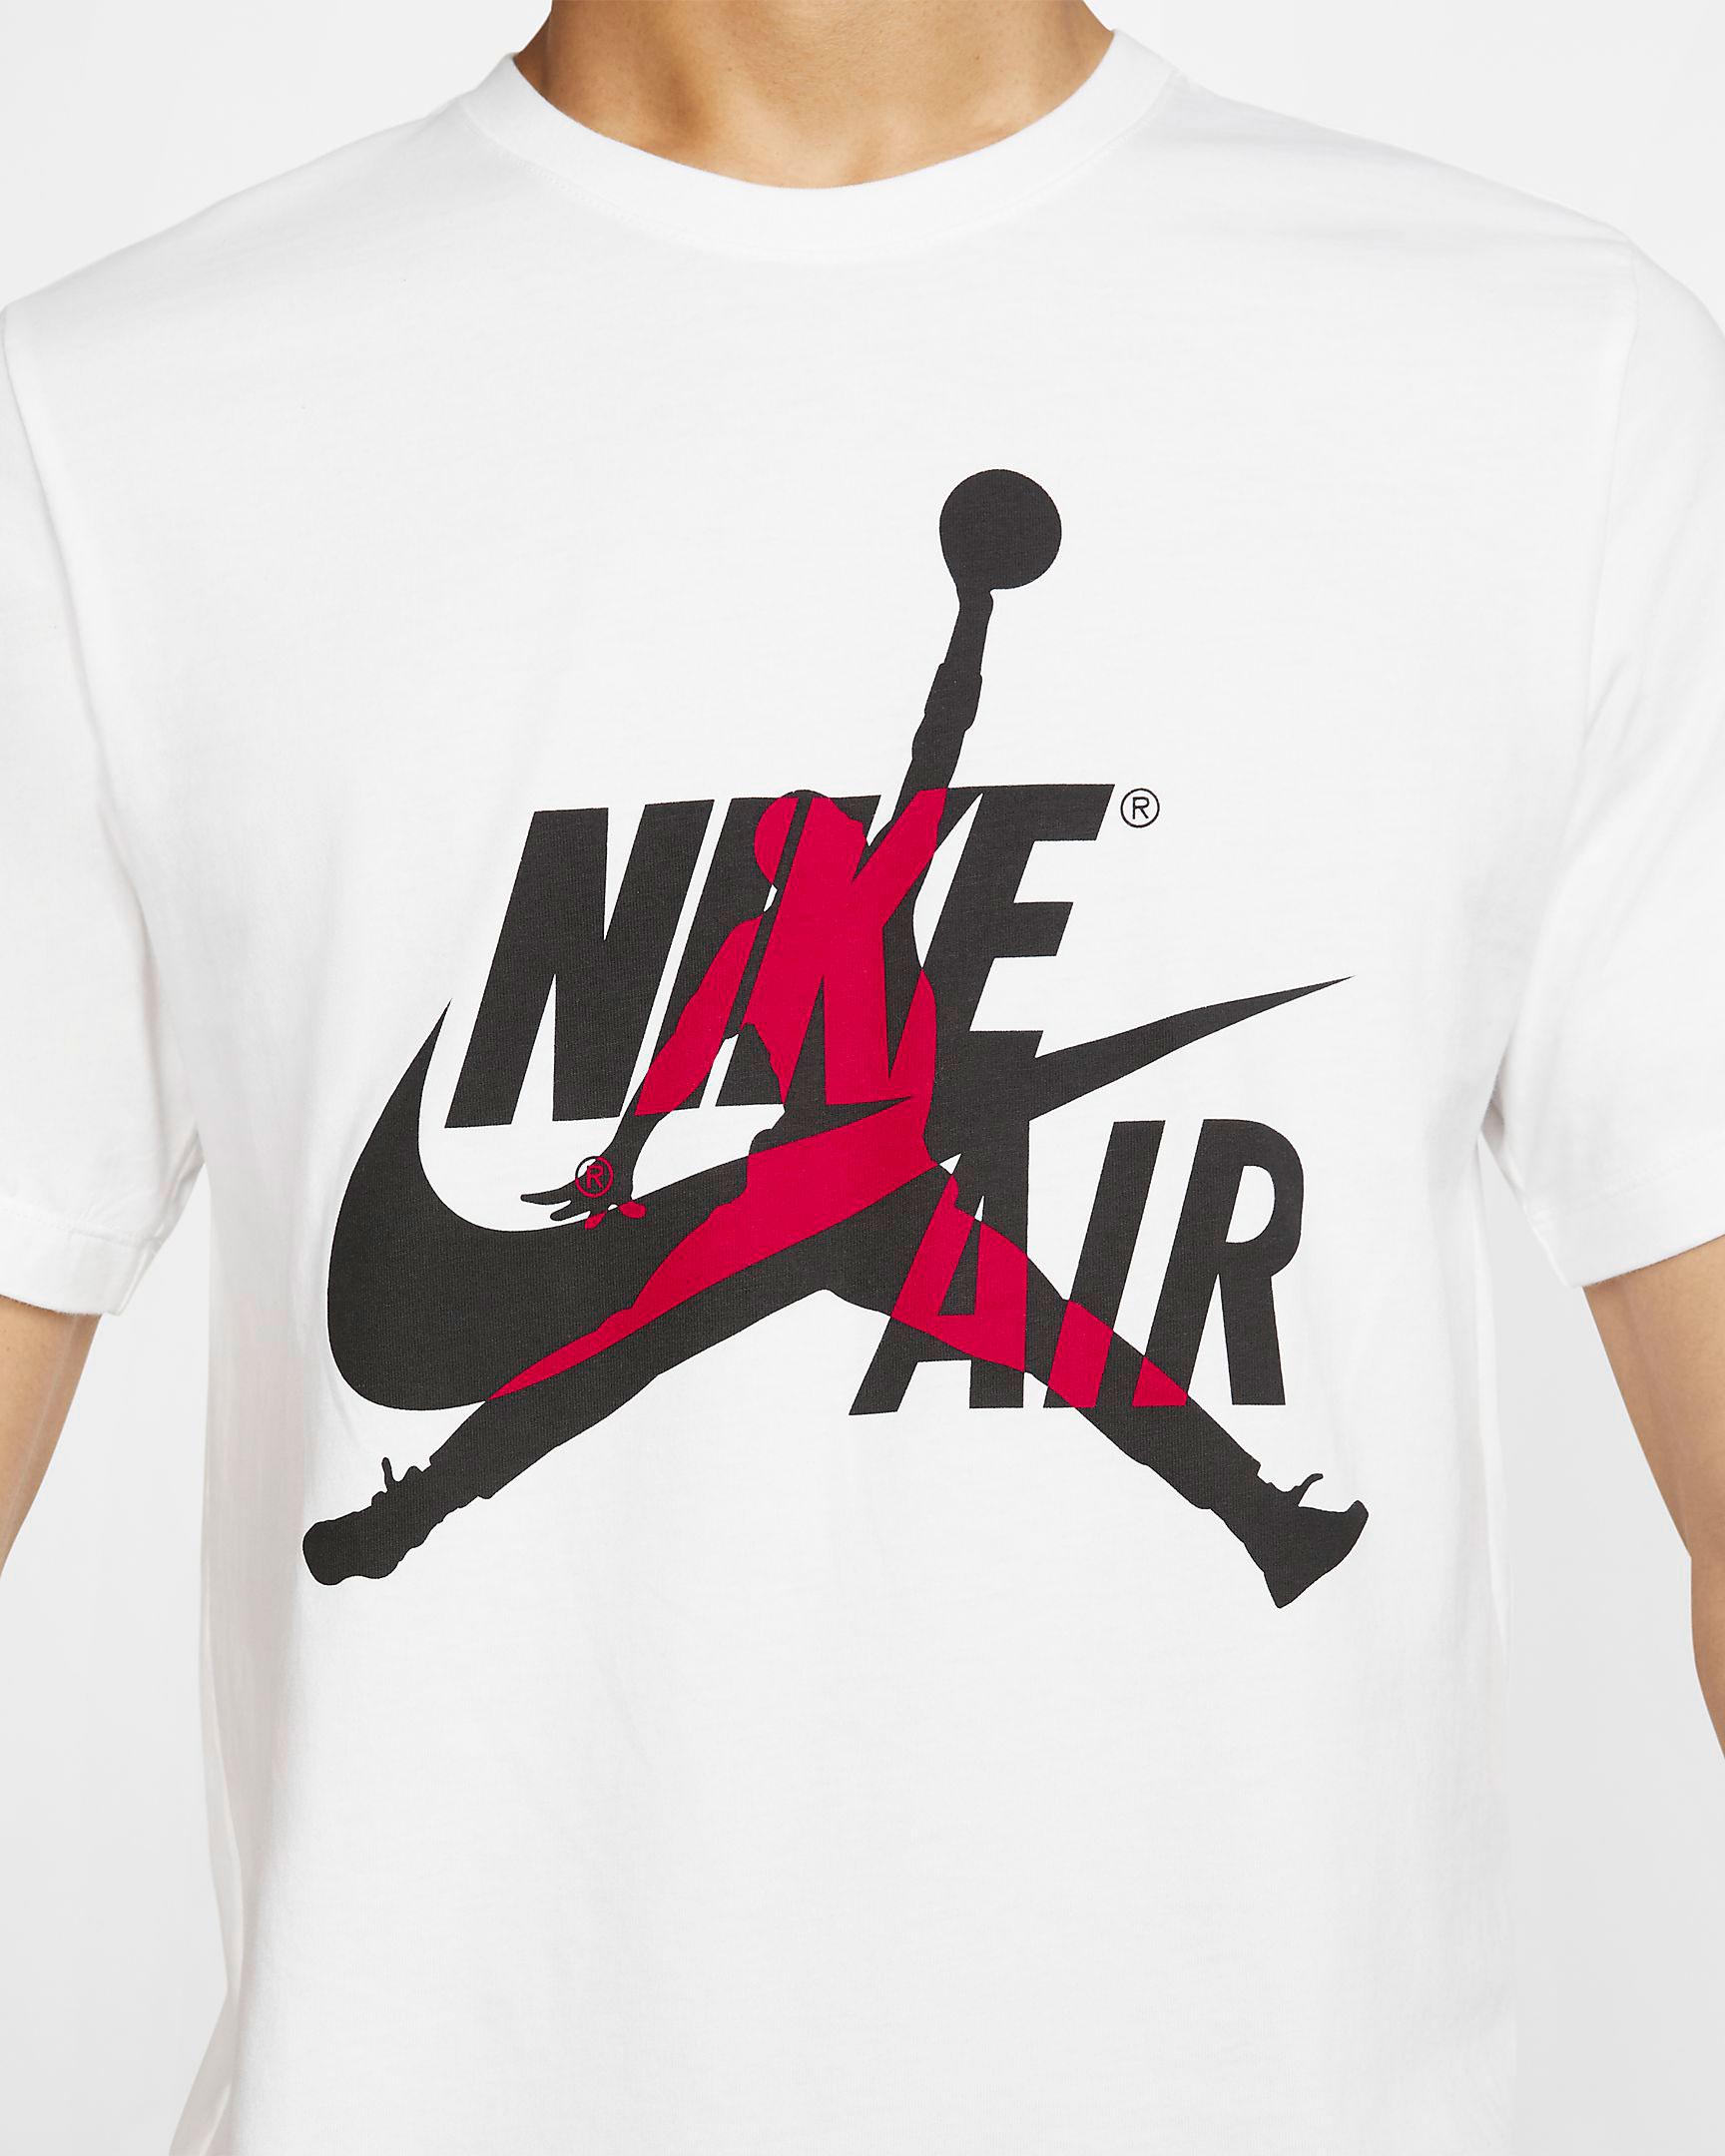 air-jordan-1-high-gym-red-t-shirt-2